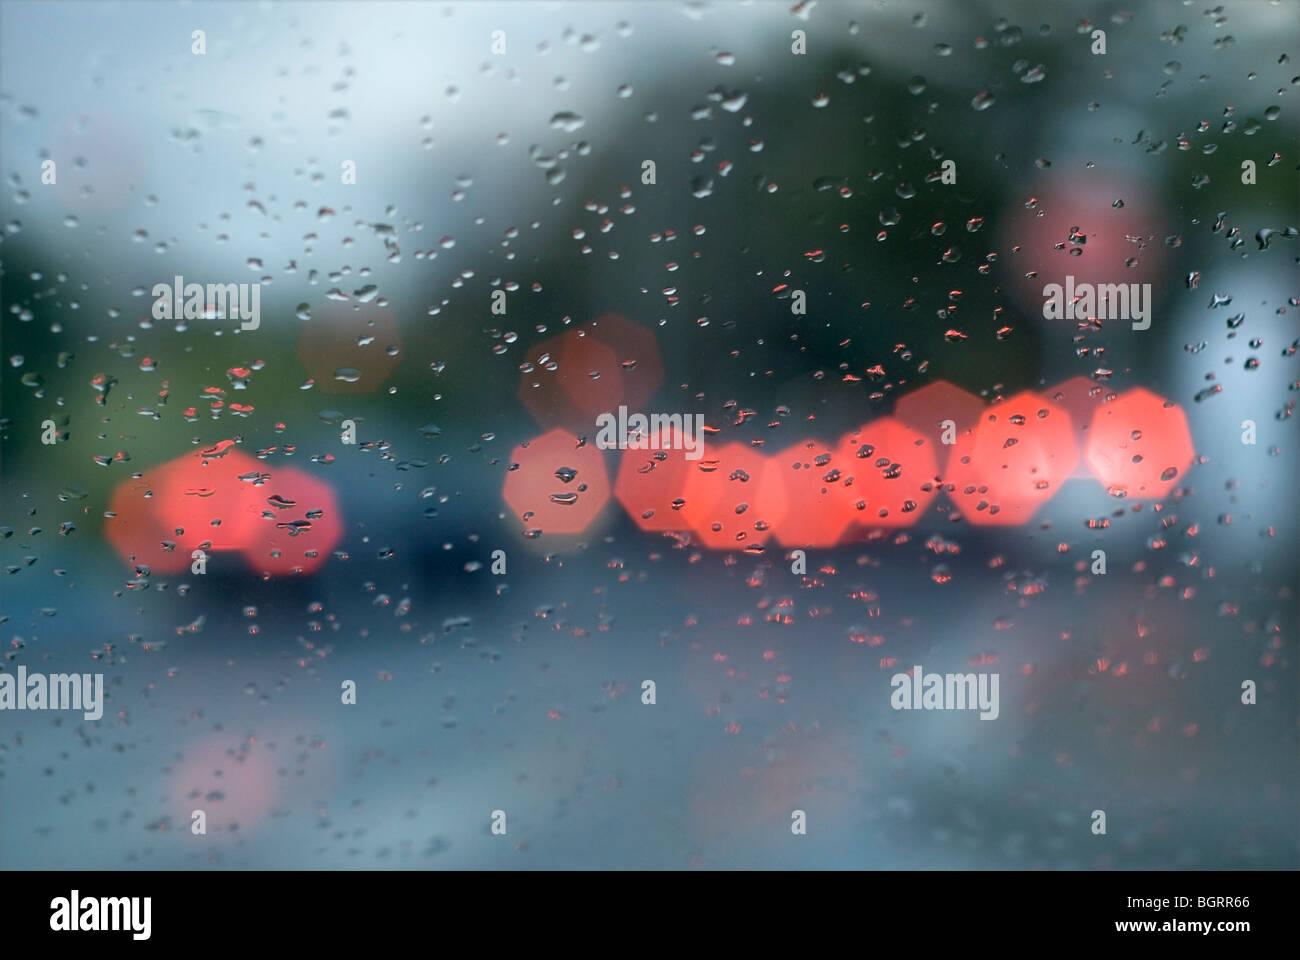 Rainy day - Stock Image